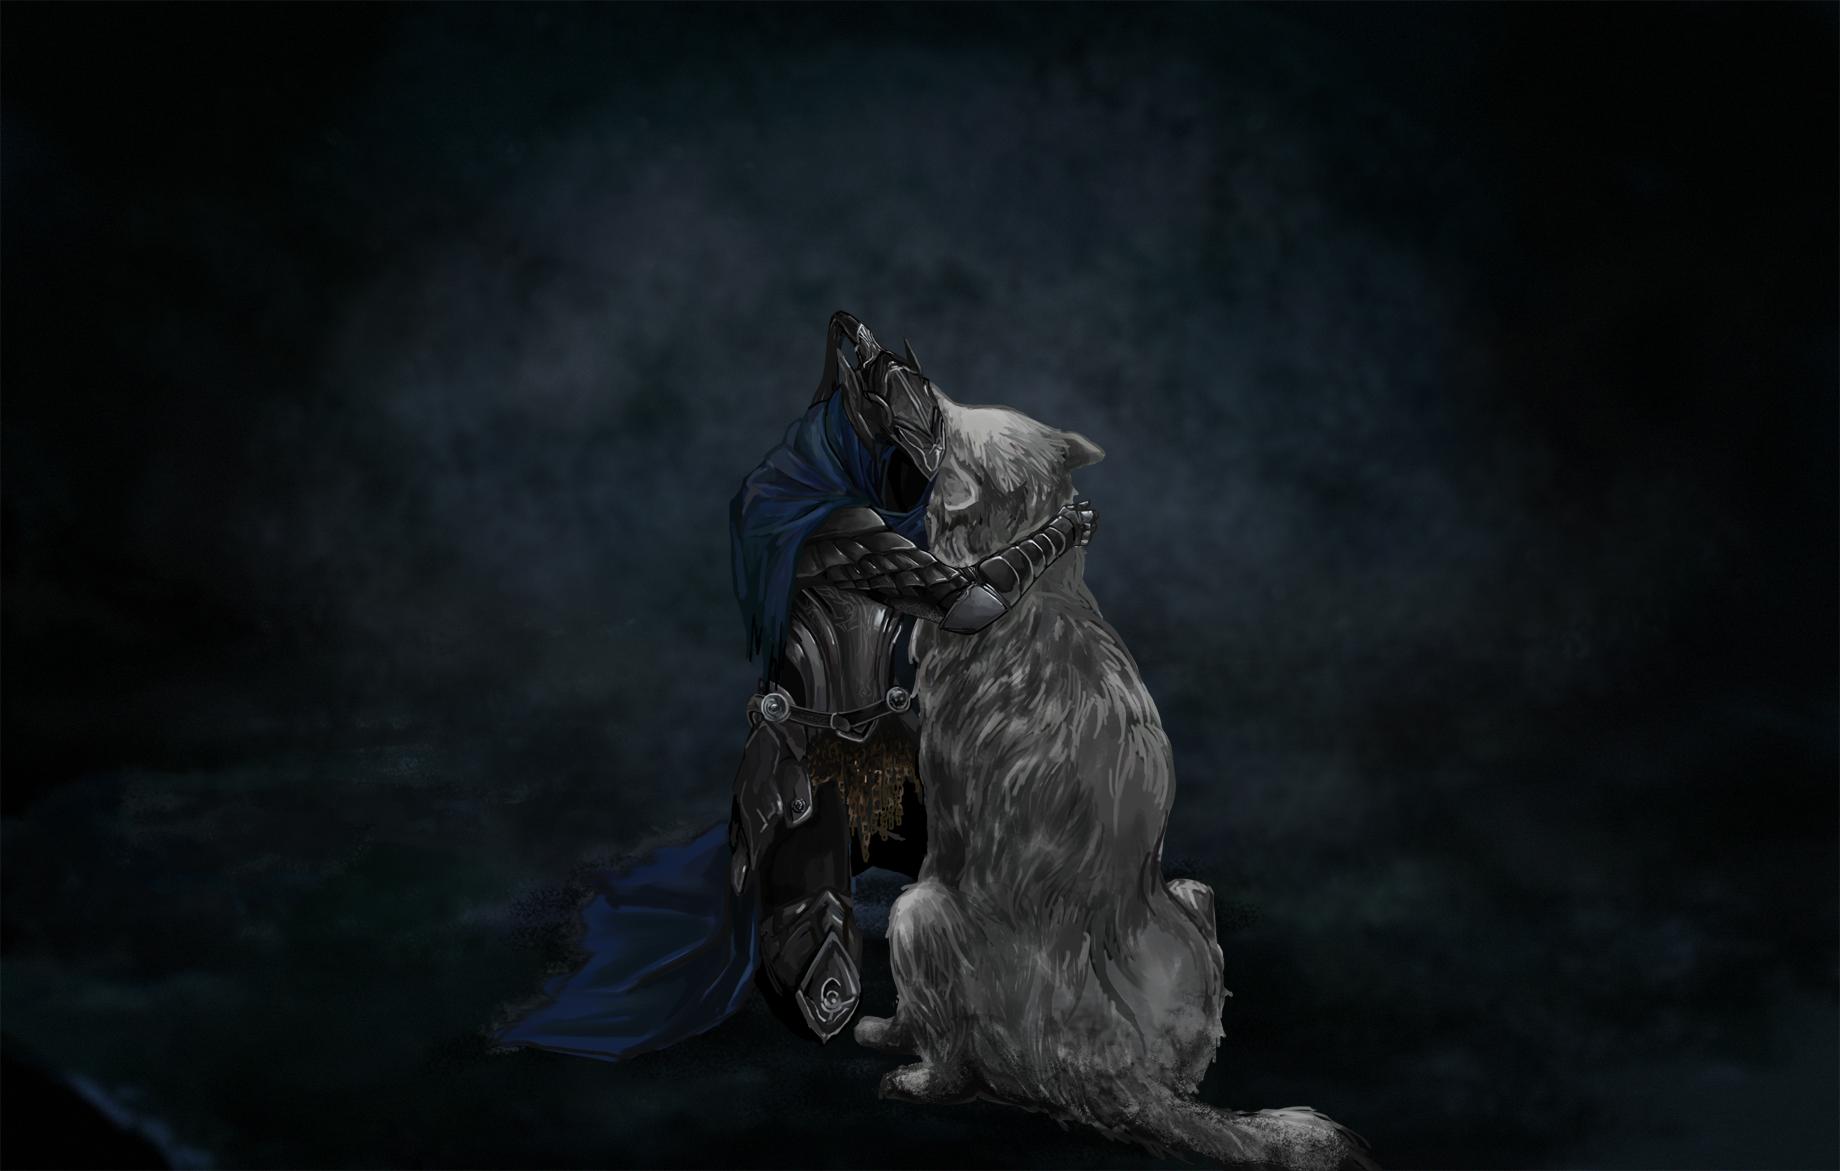 Dark Souls Knight Medieval Wolf Hug Embrace dark fantasy wallpaper 1840x1171